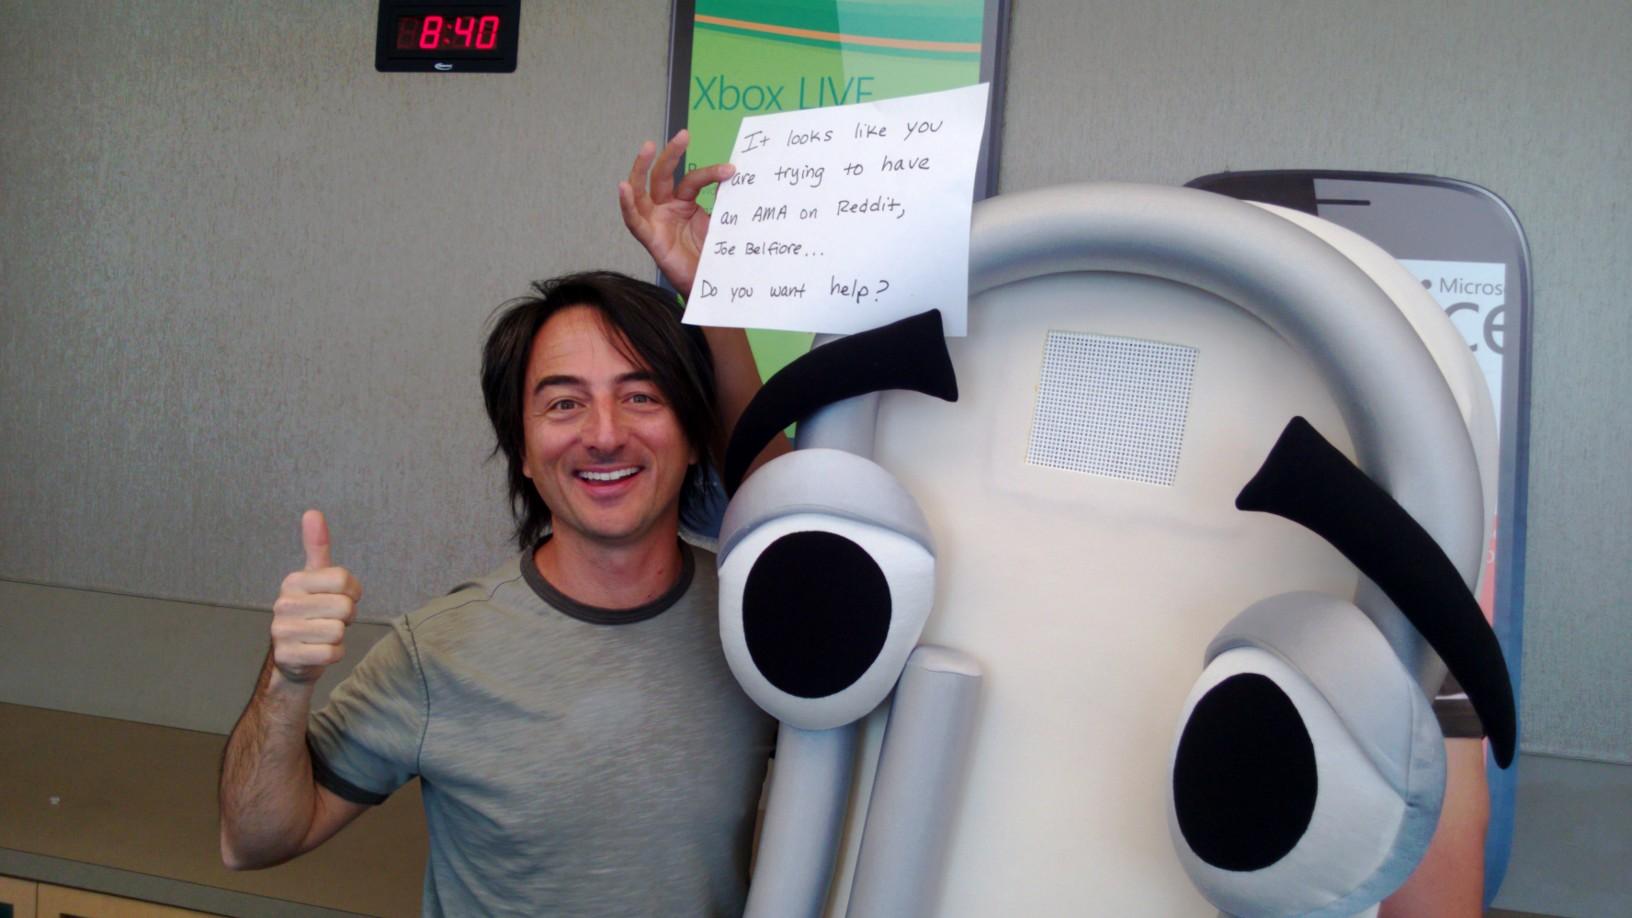 Joe Belfiore Reddit AMA